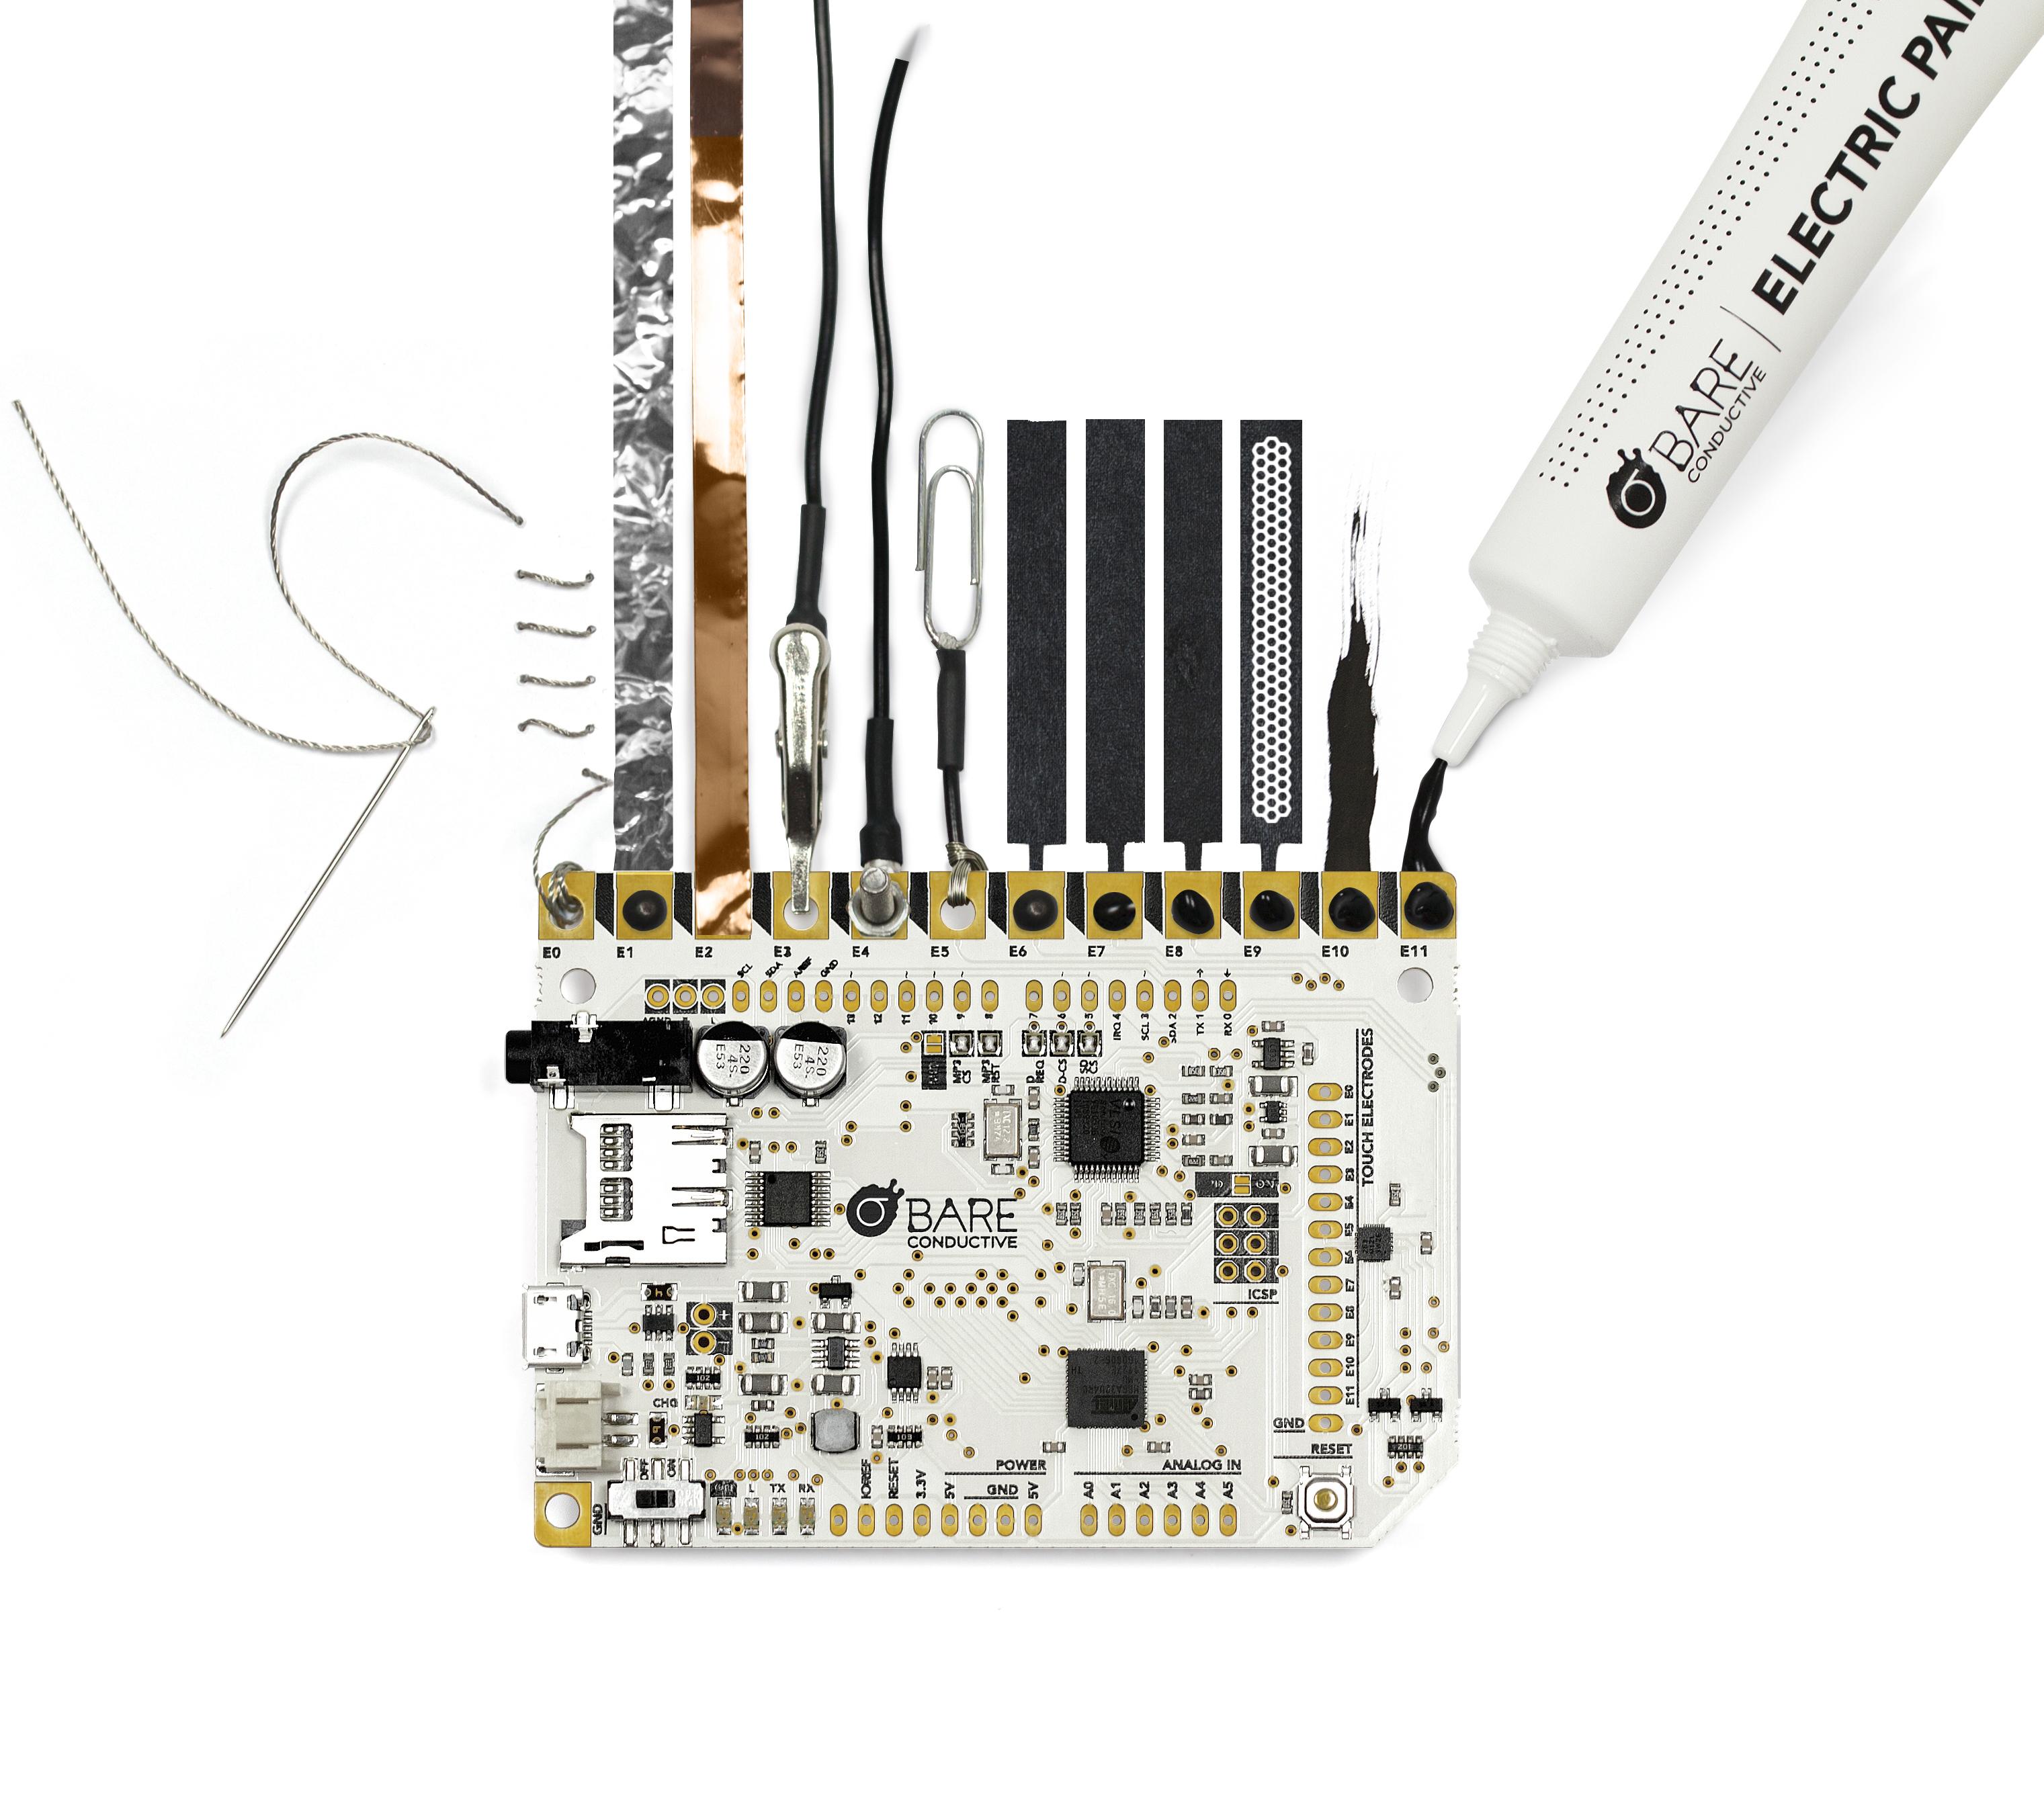 TouchBoard connectedBareConductiveLtd.2015